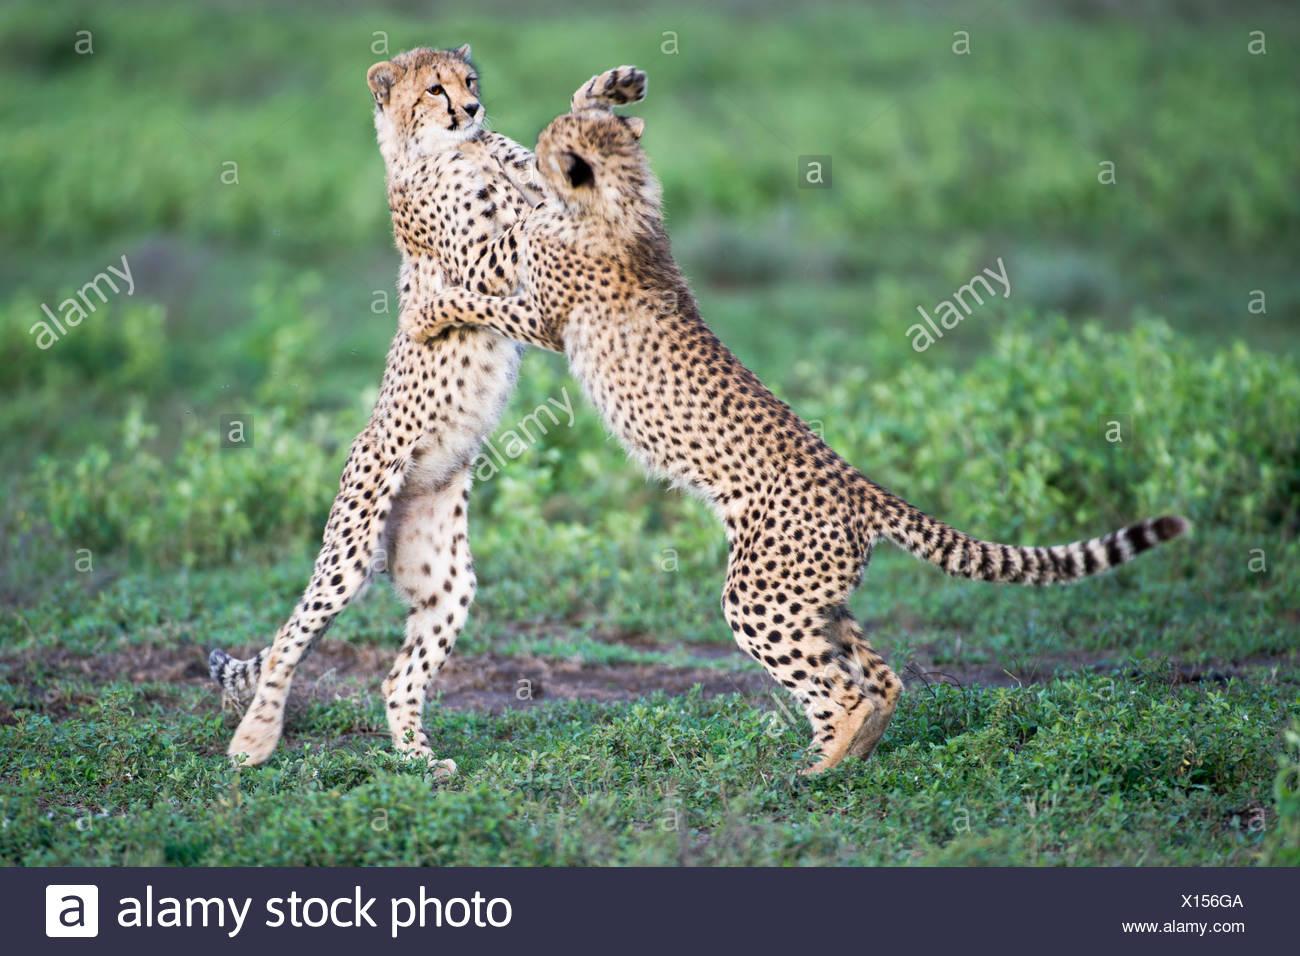 Young Cheetah cubs playing, Ndutu, Serengeti, Tanzania - Stock Image